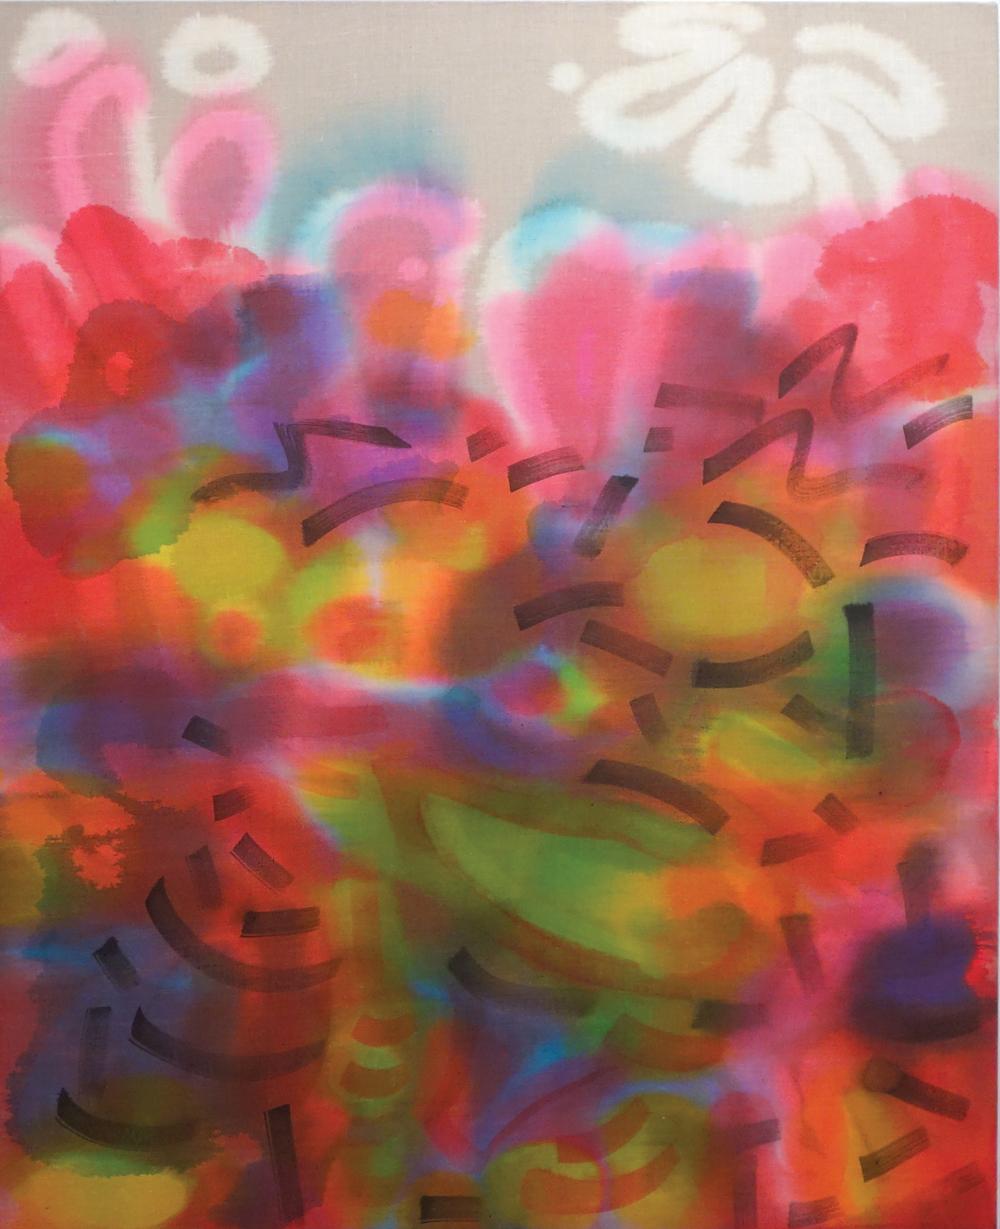 "Saira McLaren, Club Scene, 2013, fabric dye on raw linen, 45"" x 36"". Photo: Mike Hein. Courtesy of the artist."